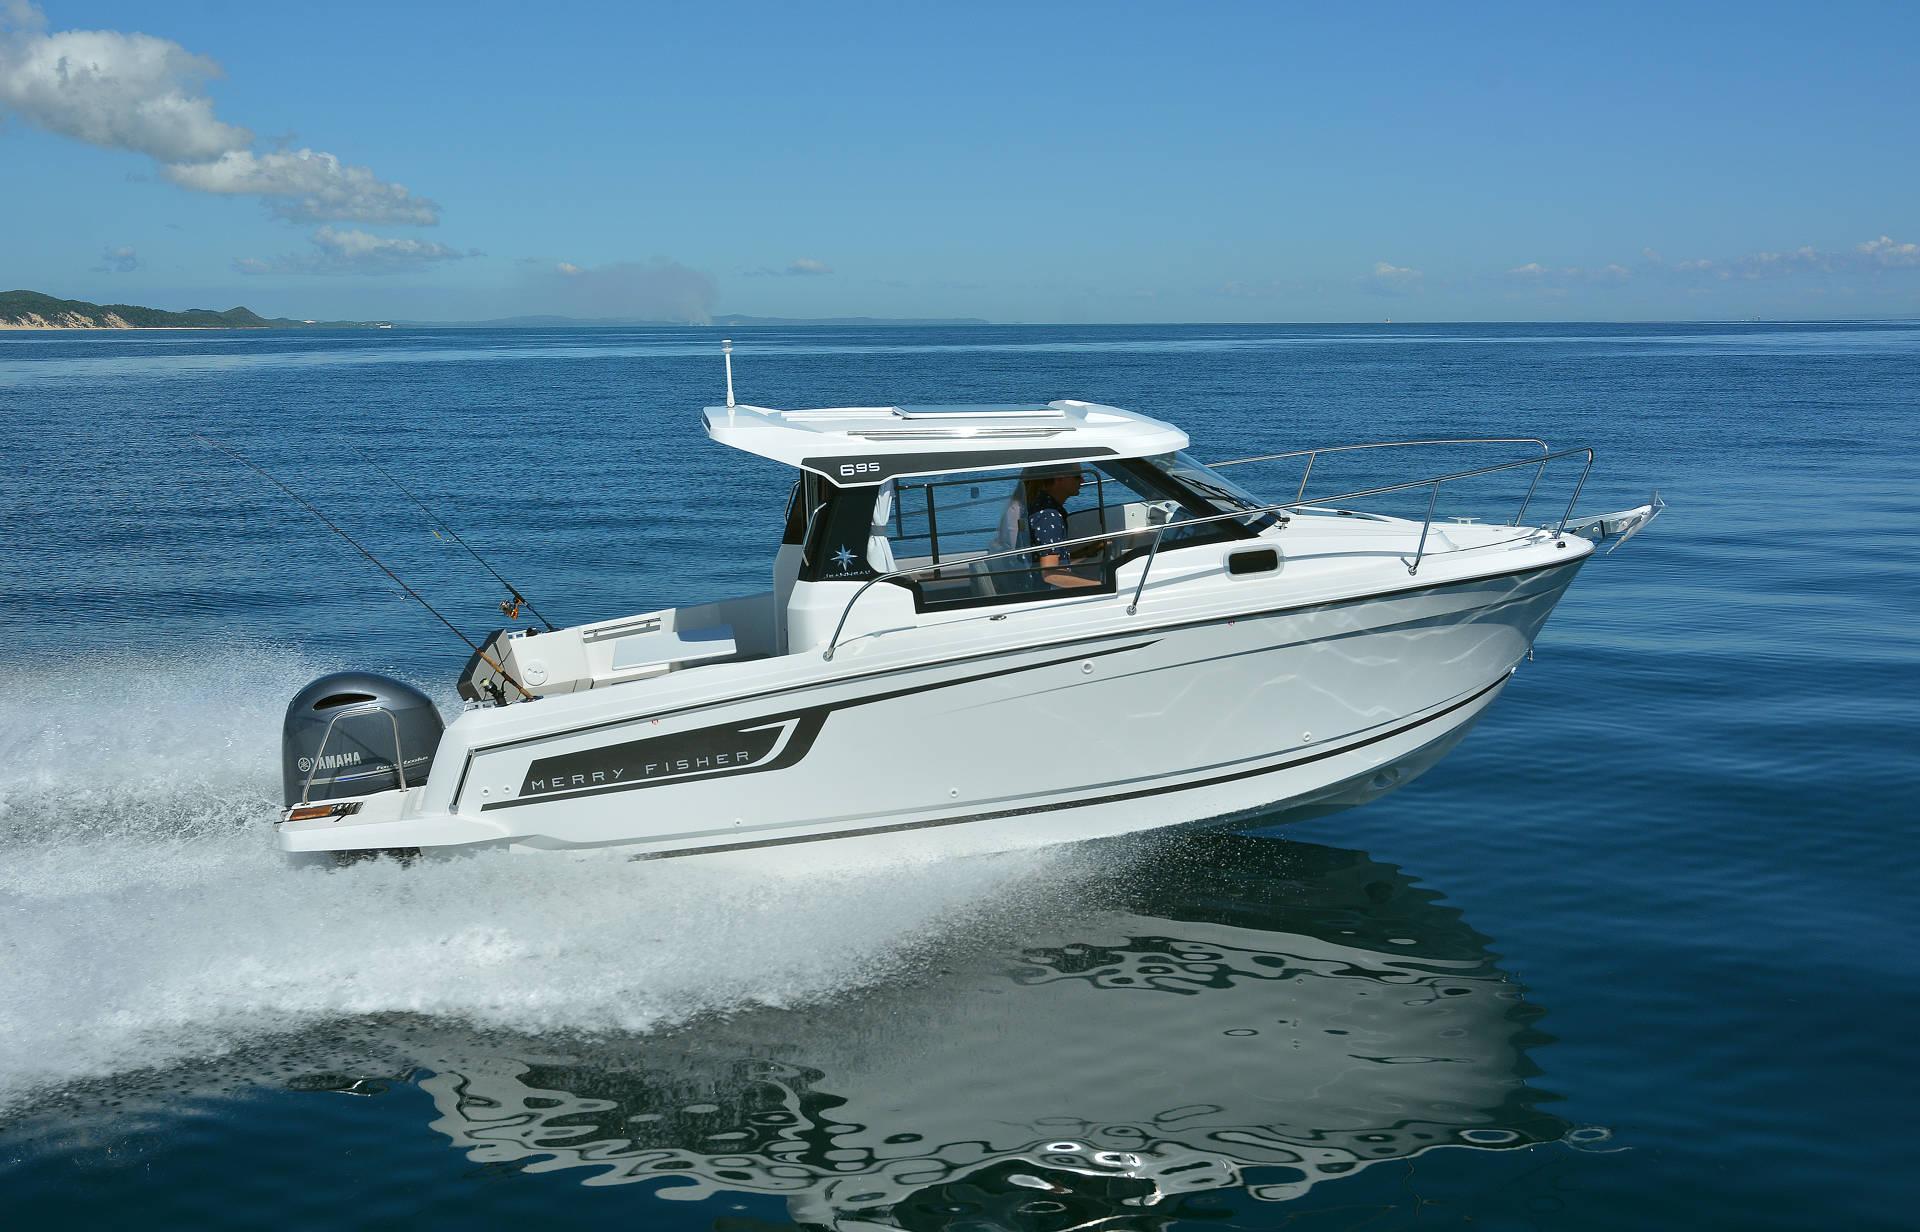 Tipos de barcos_barco de pesca deportiva